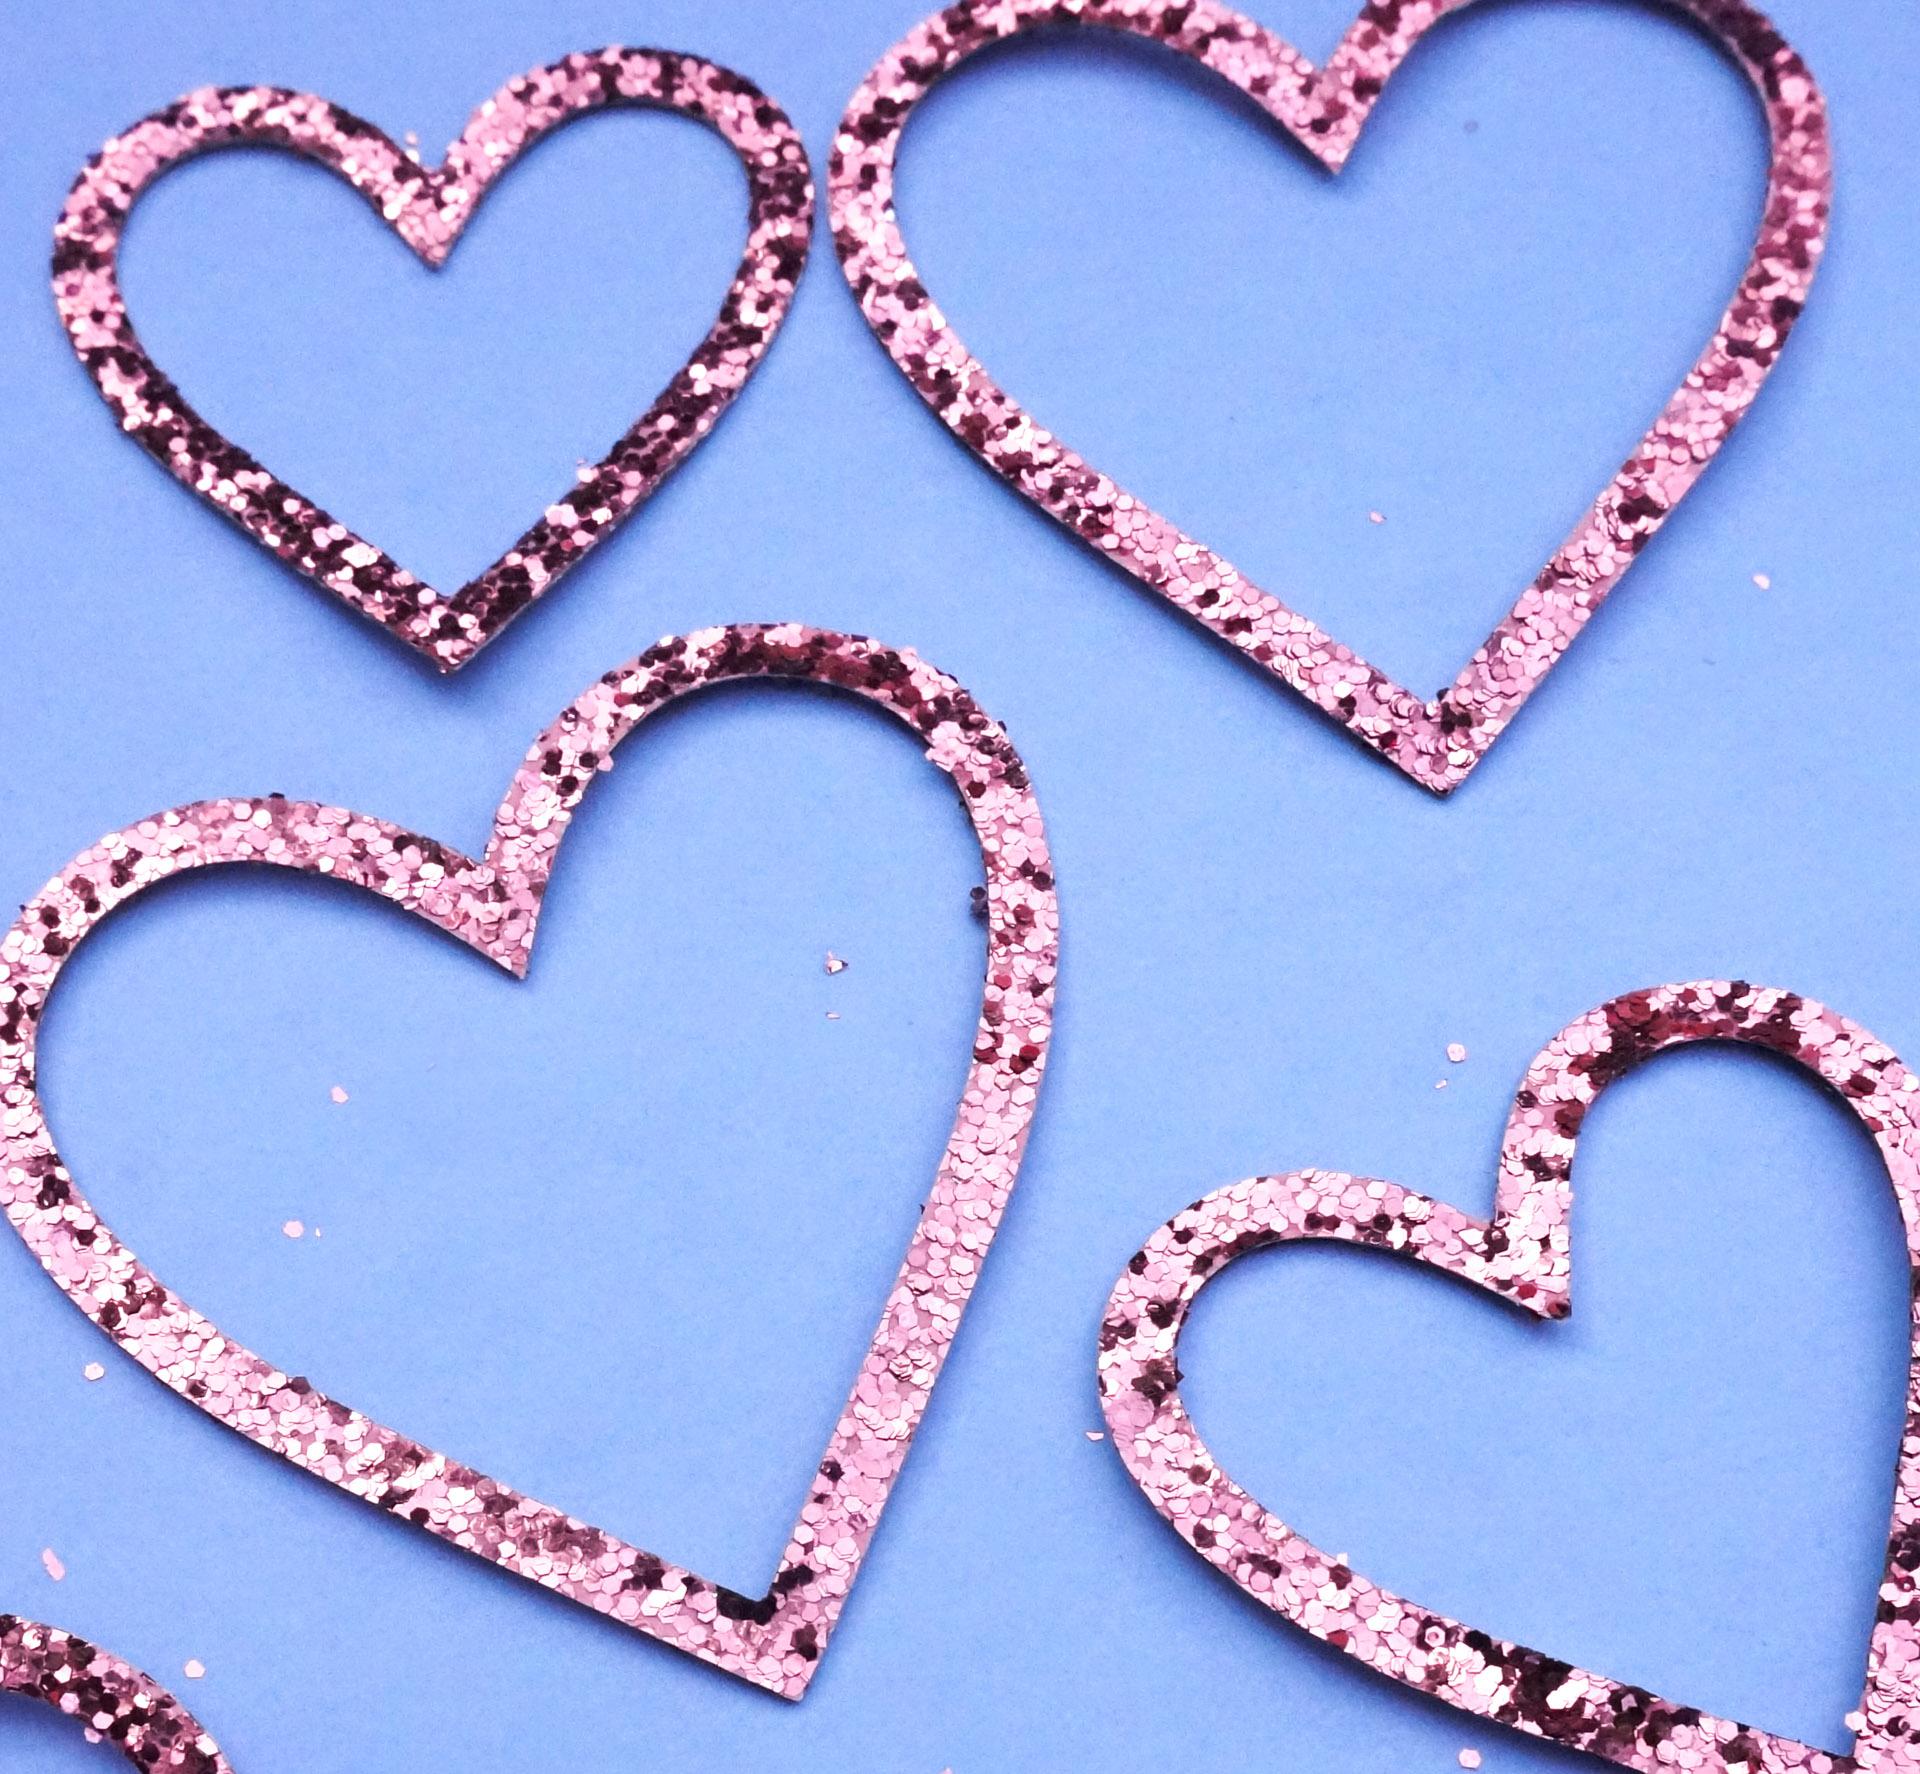 Glittering Valentine's Day hearts